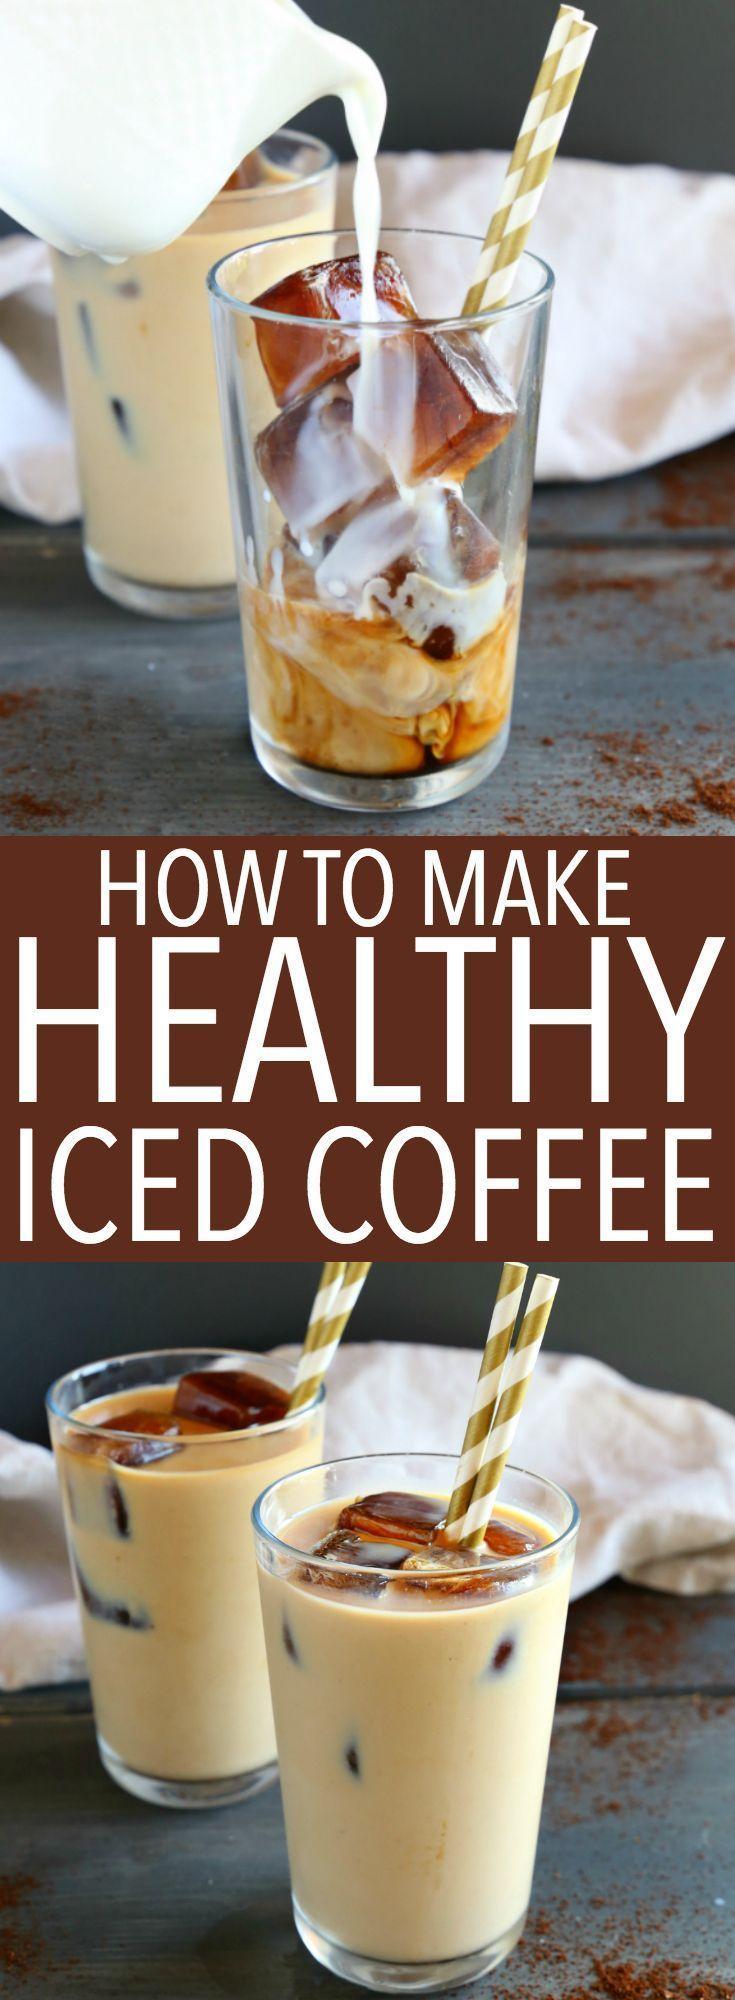 Healthy iced coffee recipe healthy iced coffee iced